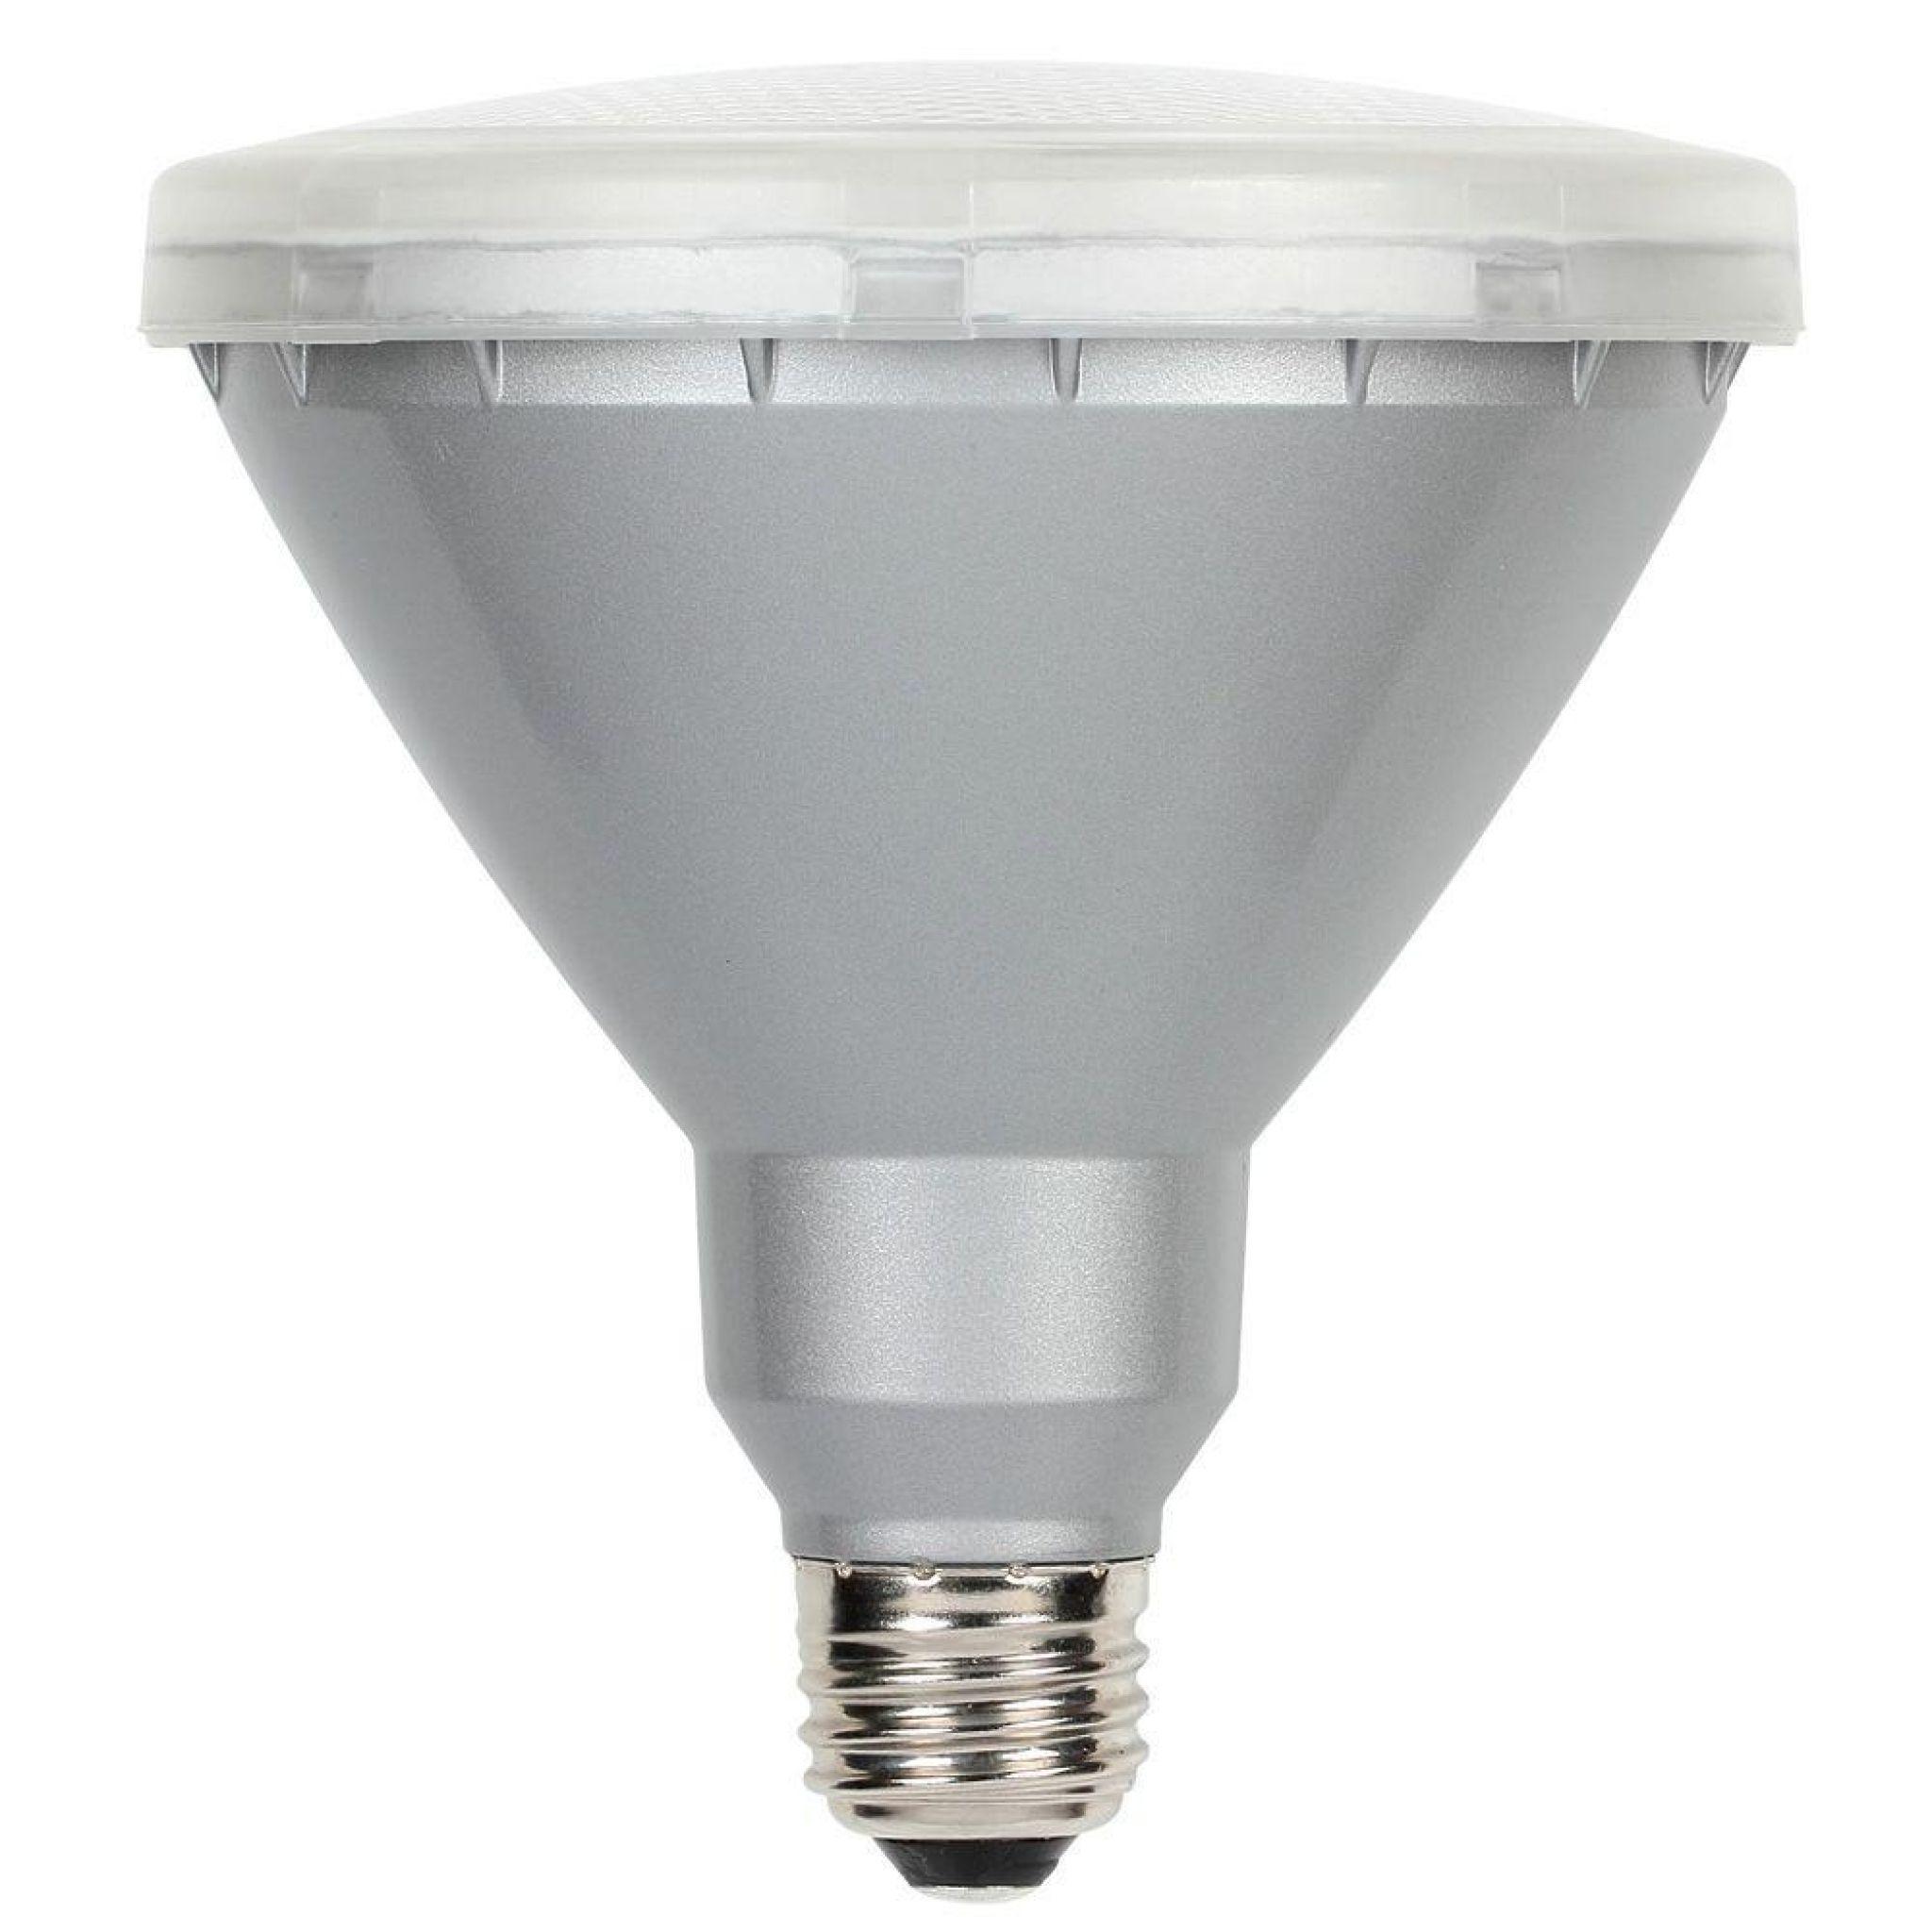 Outdoor Led Flood Light Bulb Interior House Paint Colors Check